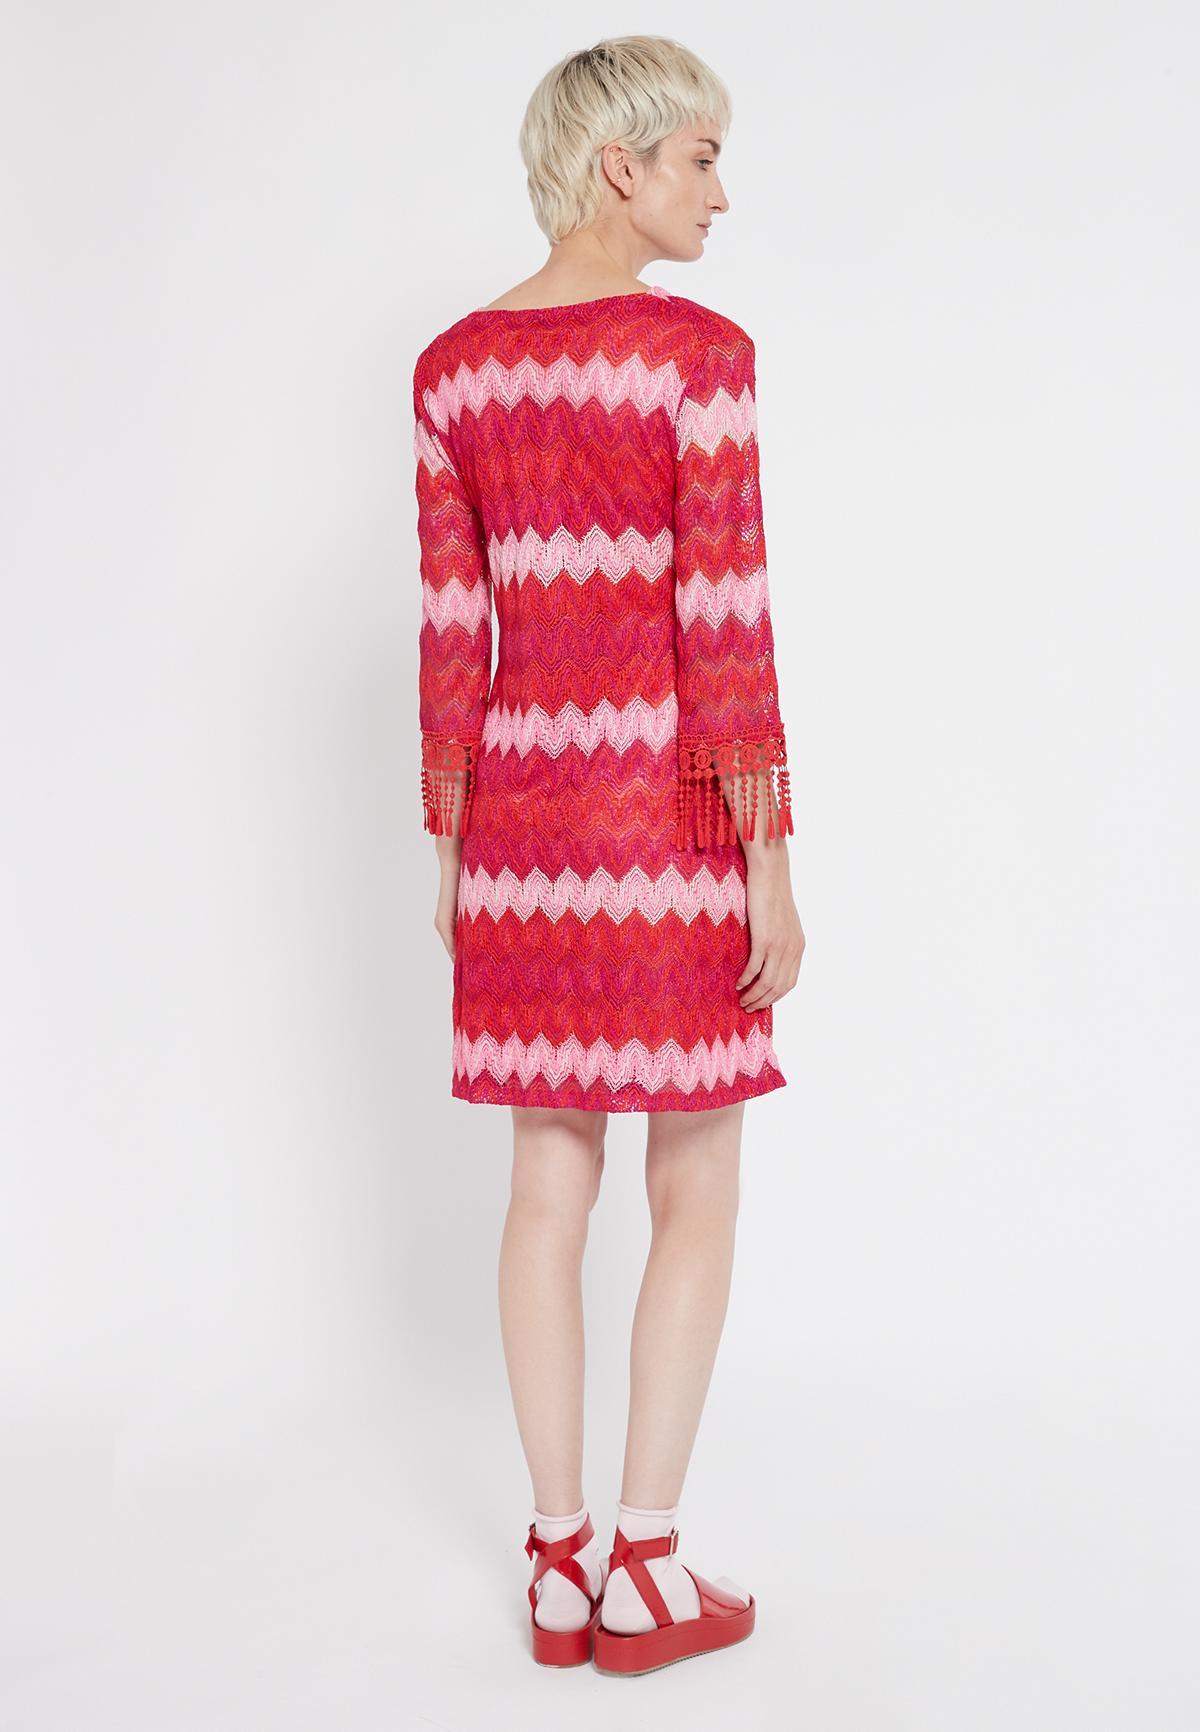 Rückansicht von Ana Alcazar Fransenarm Kleid Soshyma  angezogen an Model